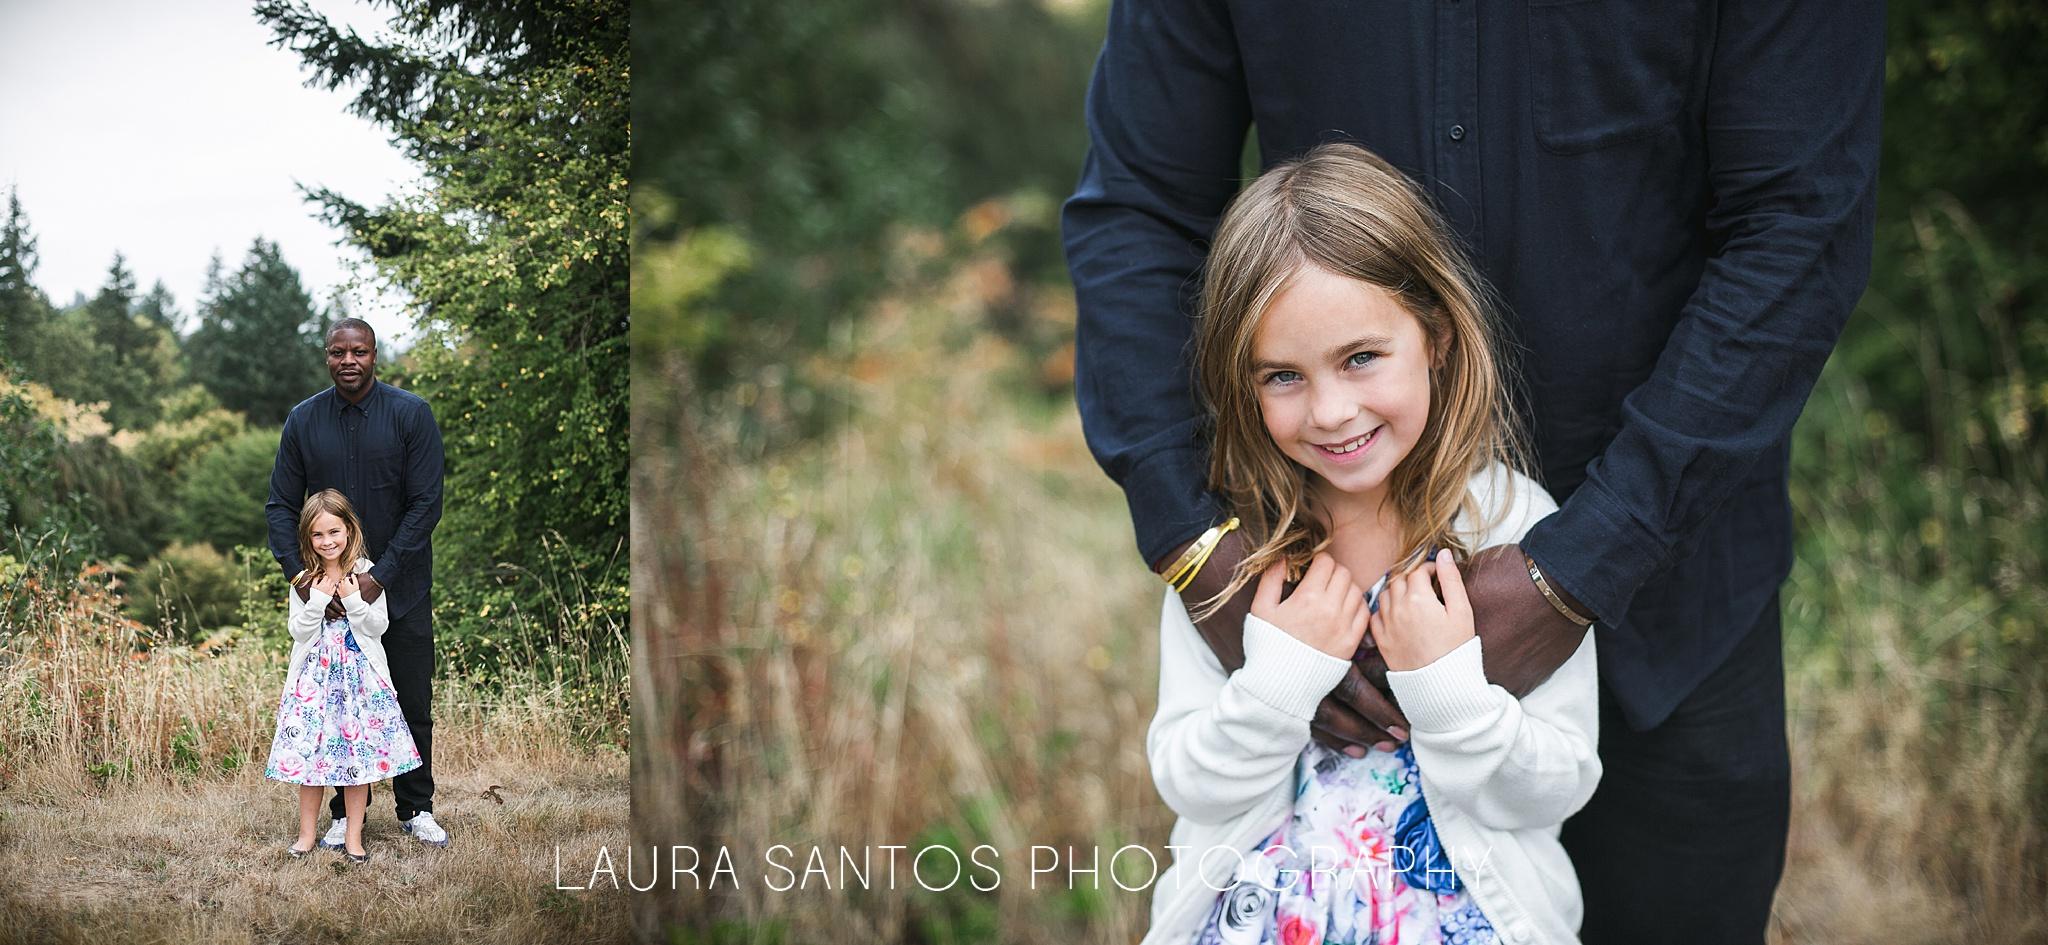 Laura Santos Photography Portland Oregon Family Photographer_0699.jpg